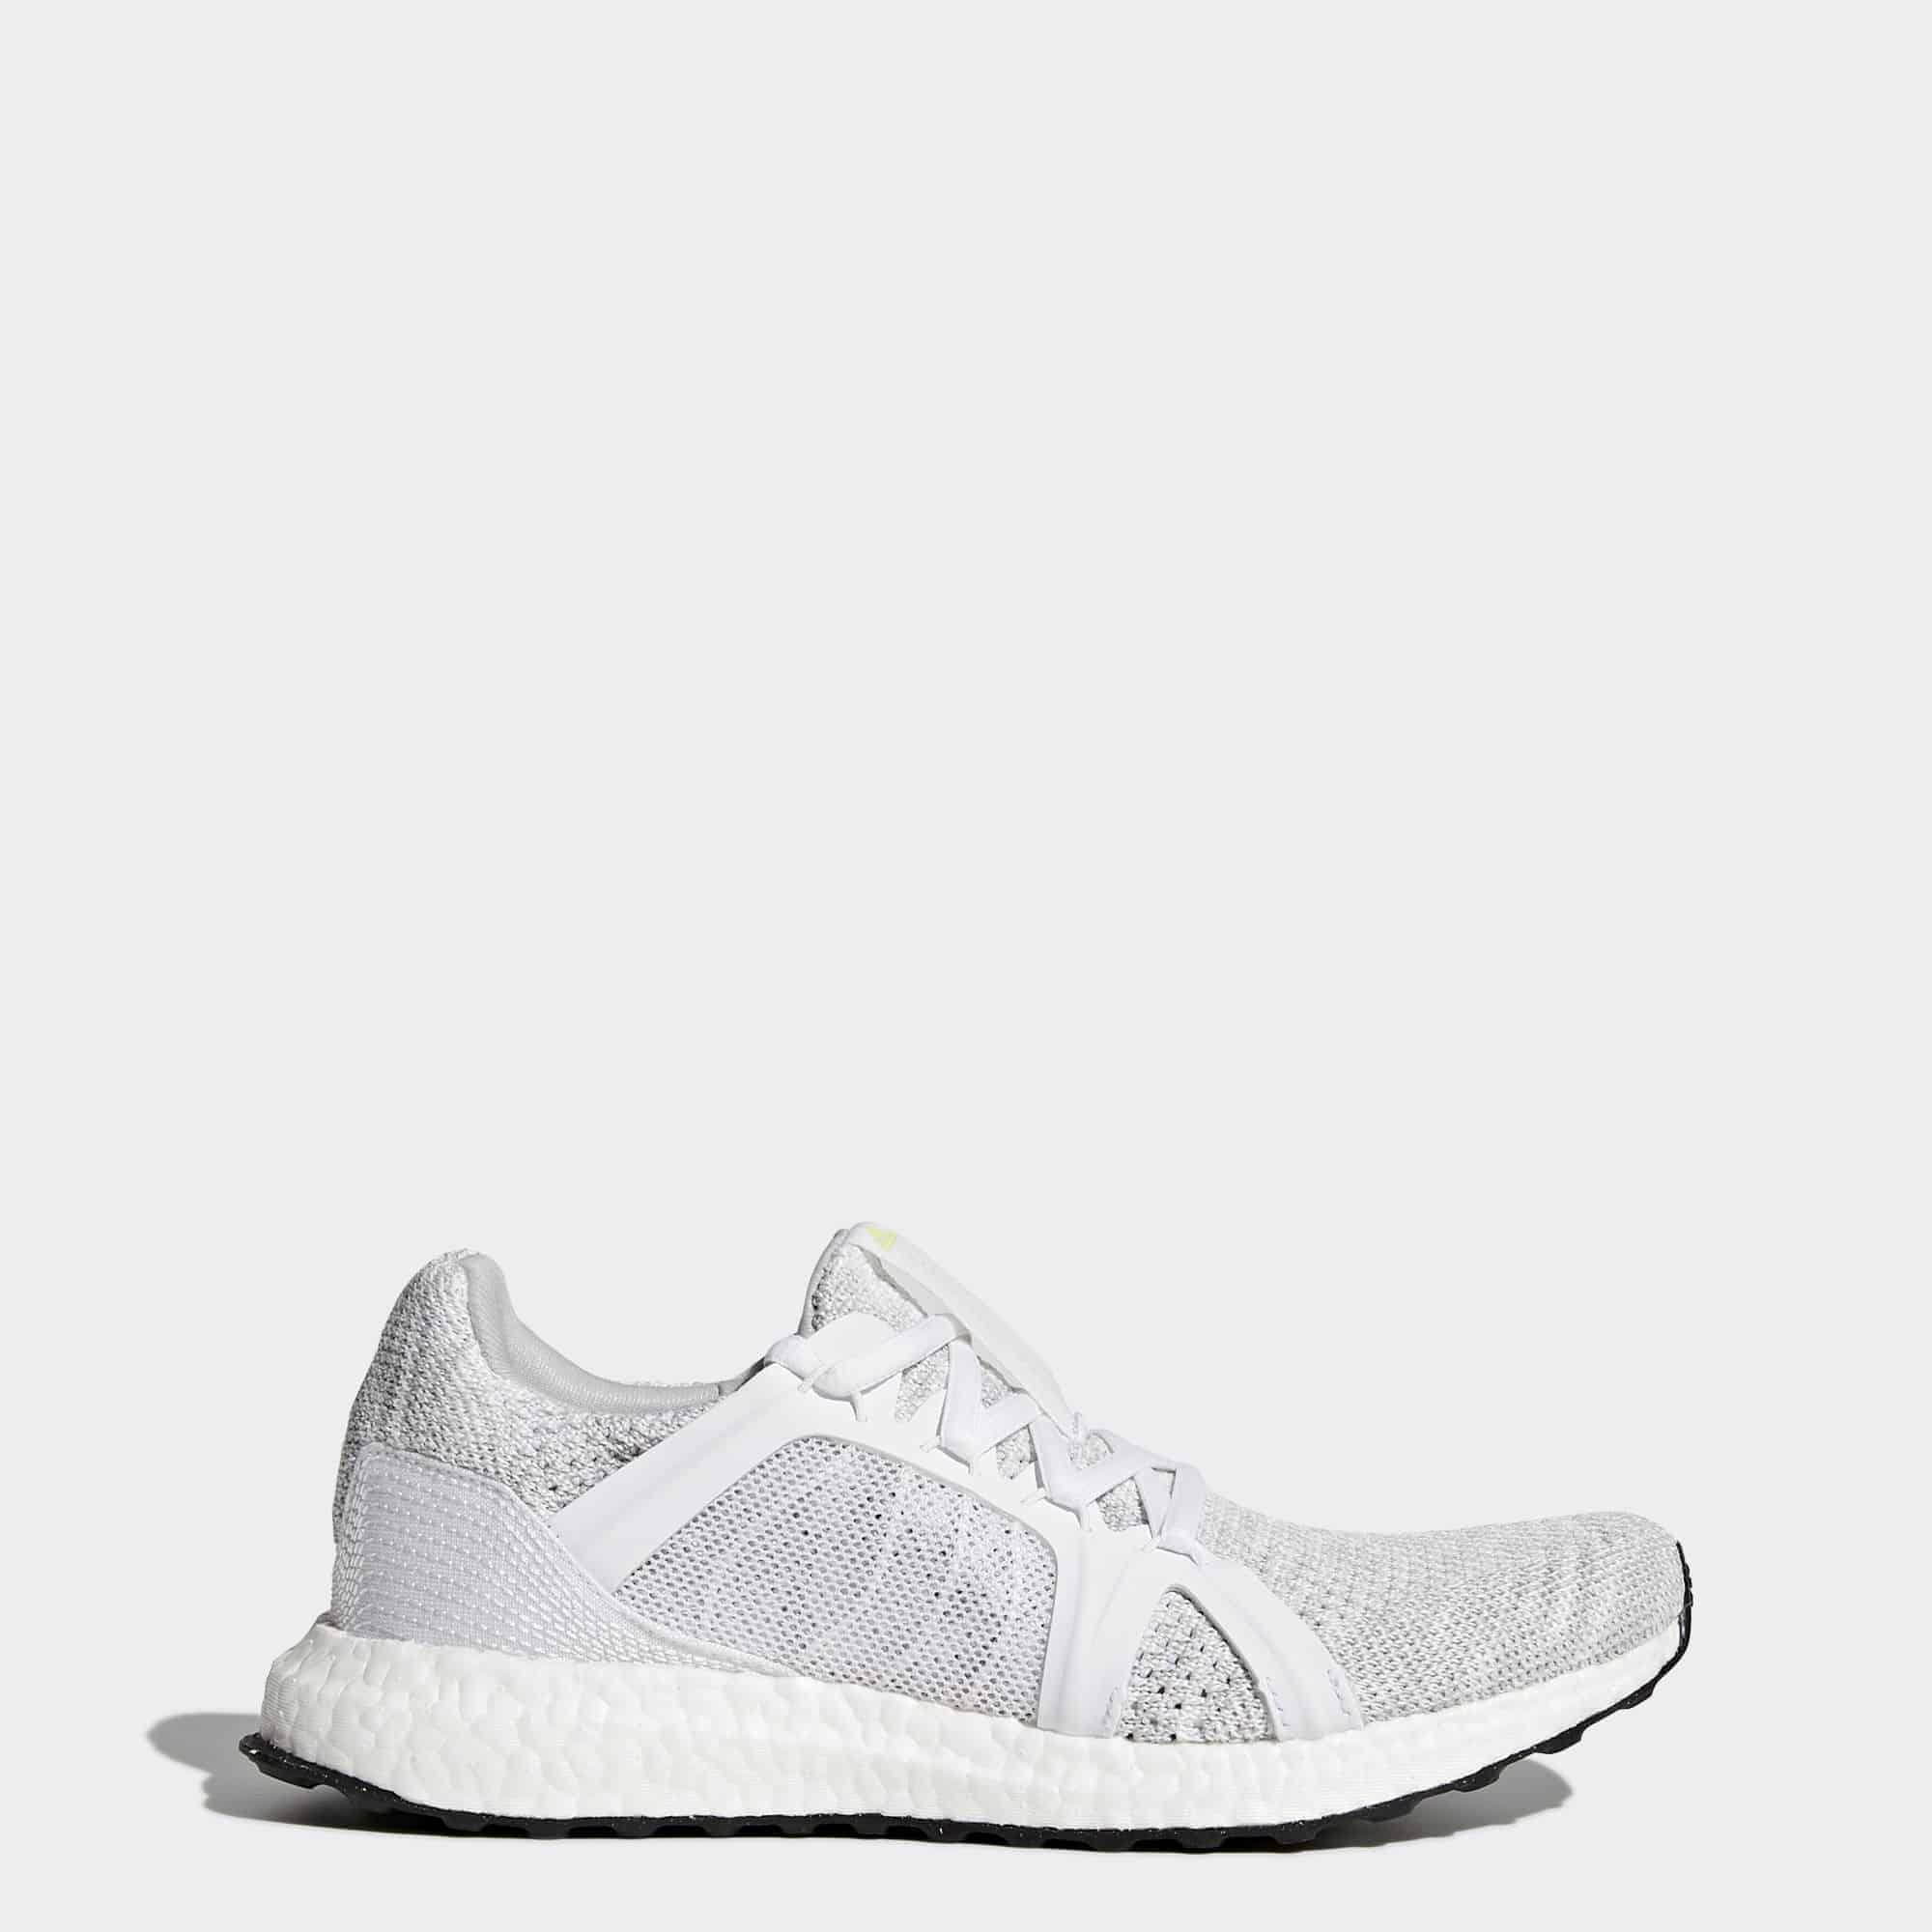 Кроссовки для бега Adidas Ultraboost Parley by Stella McCartney женские